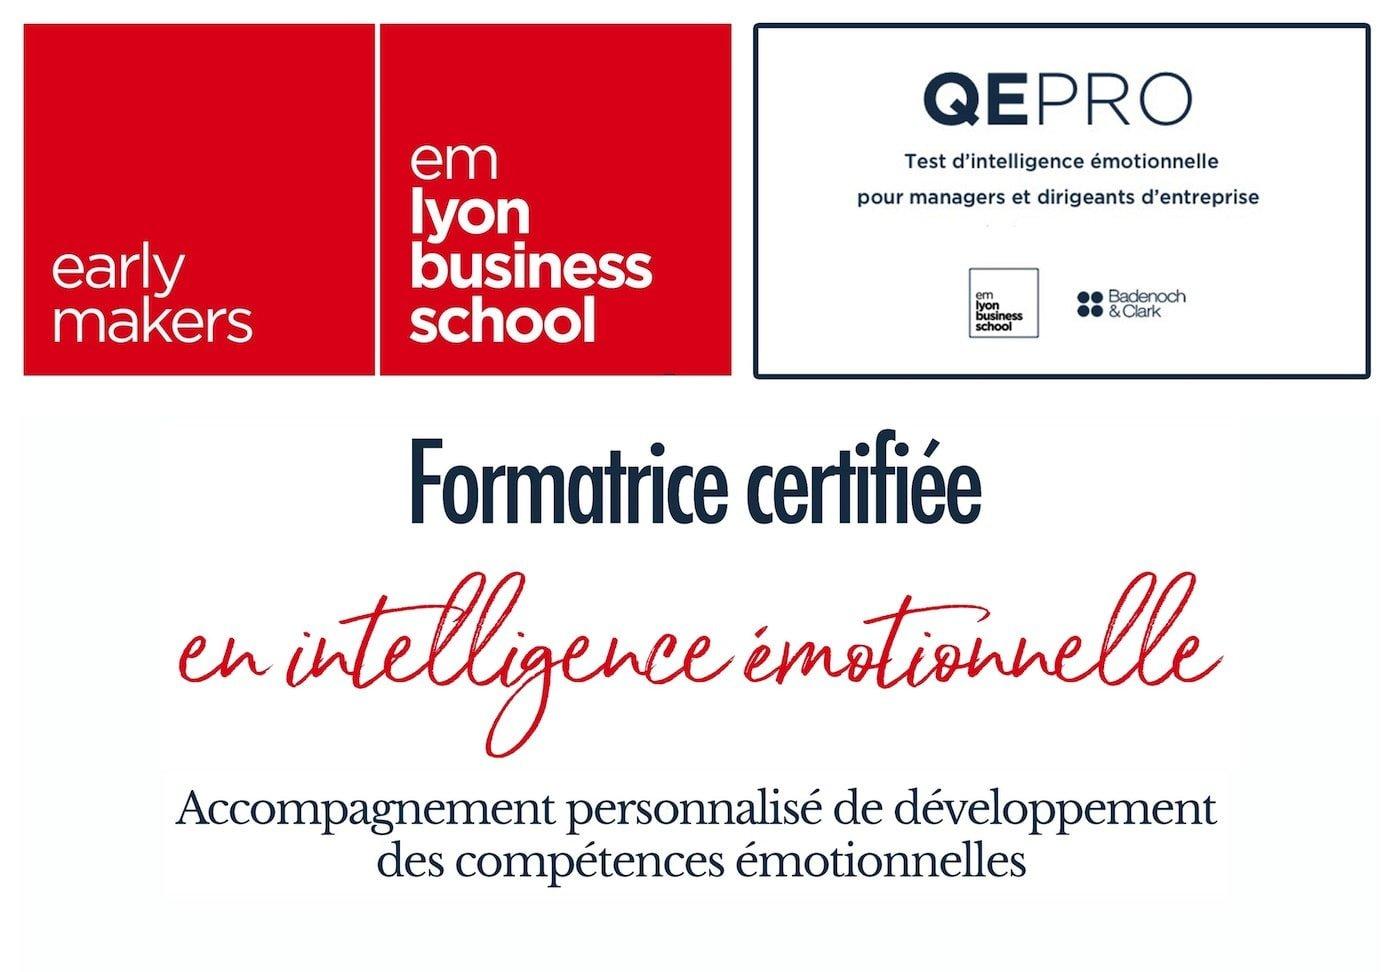 Formatrice certifiée en intelligence émotionnelle